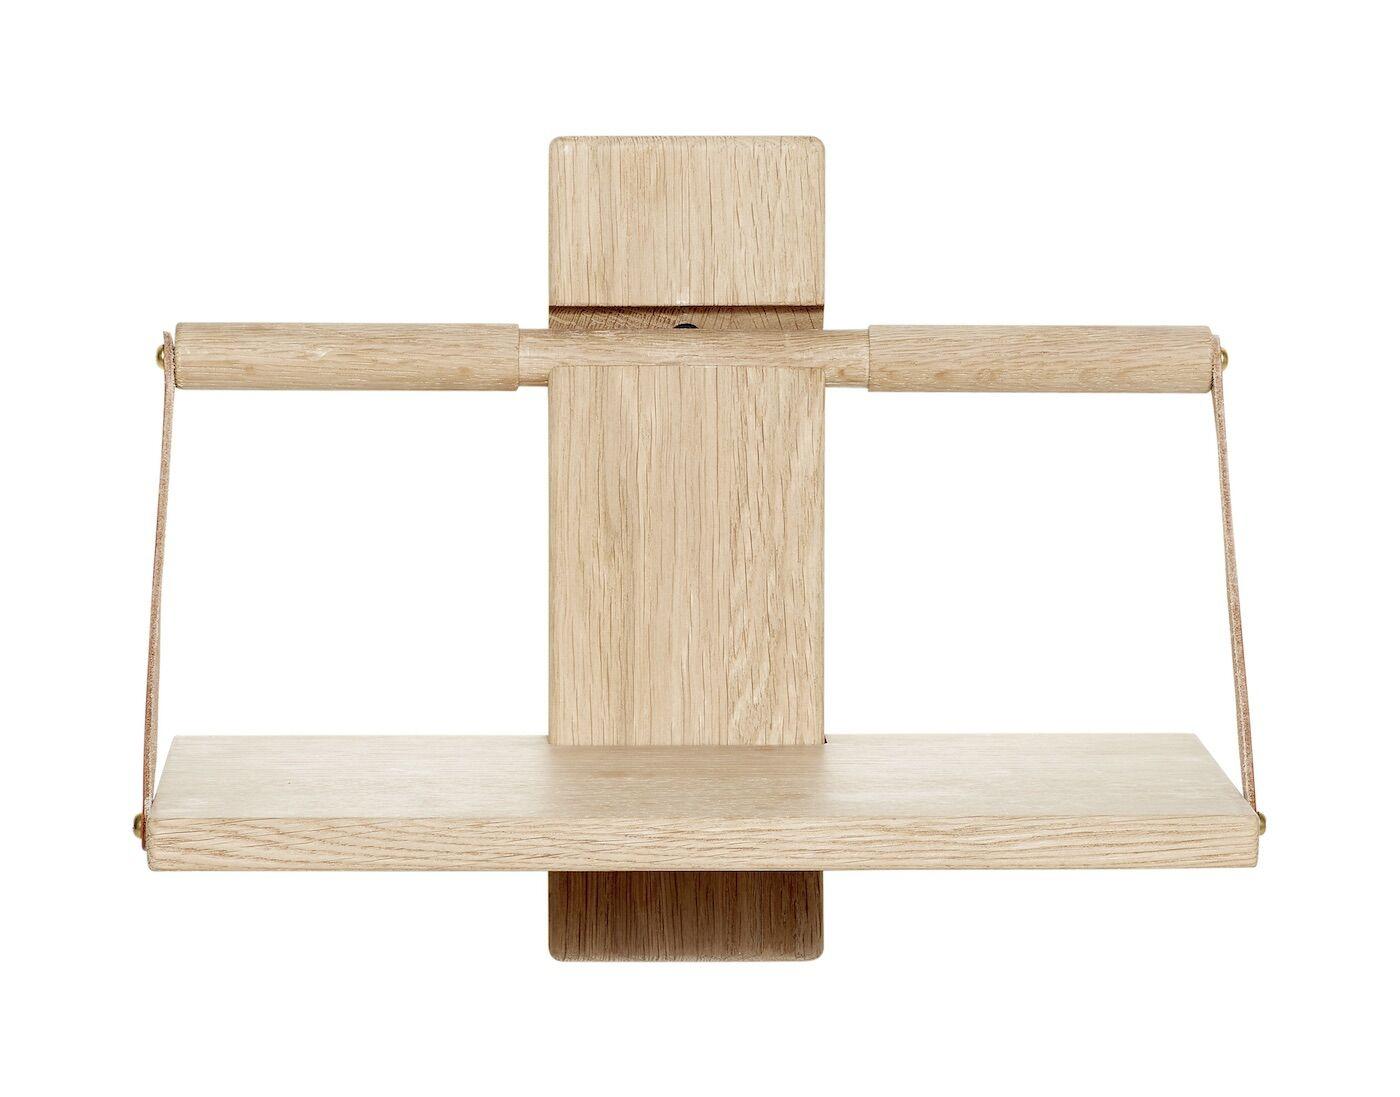 Andersen - Shelf wood wall - Small, Eg